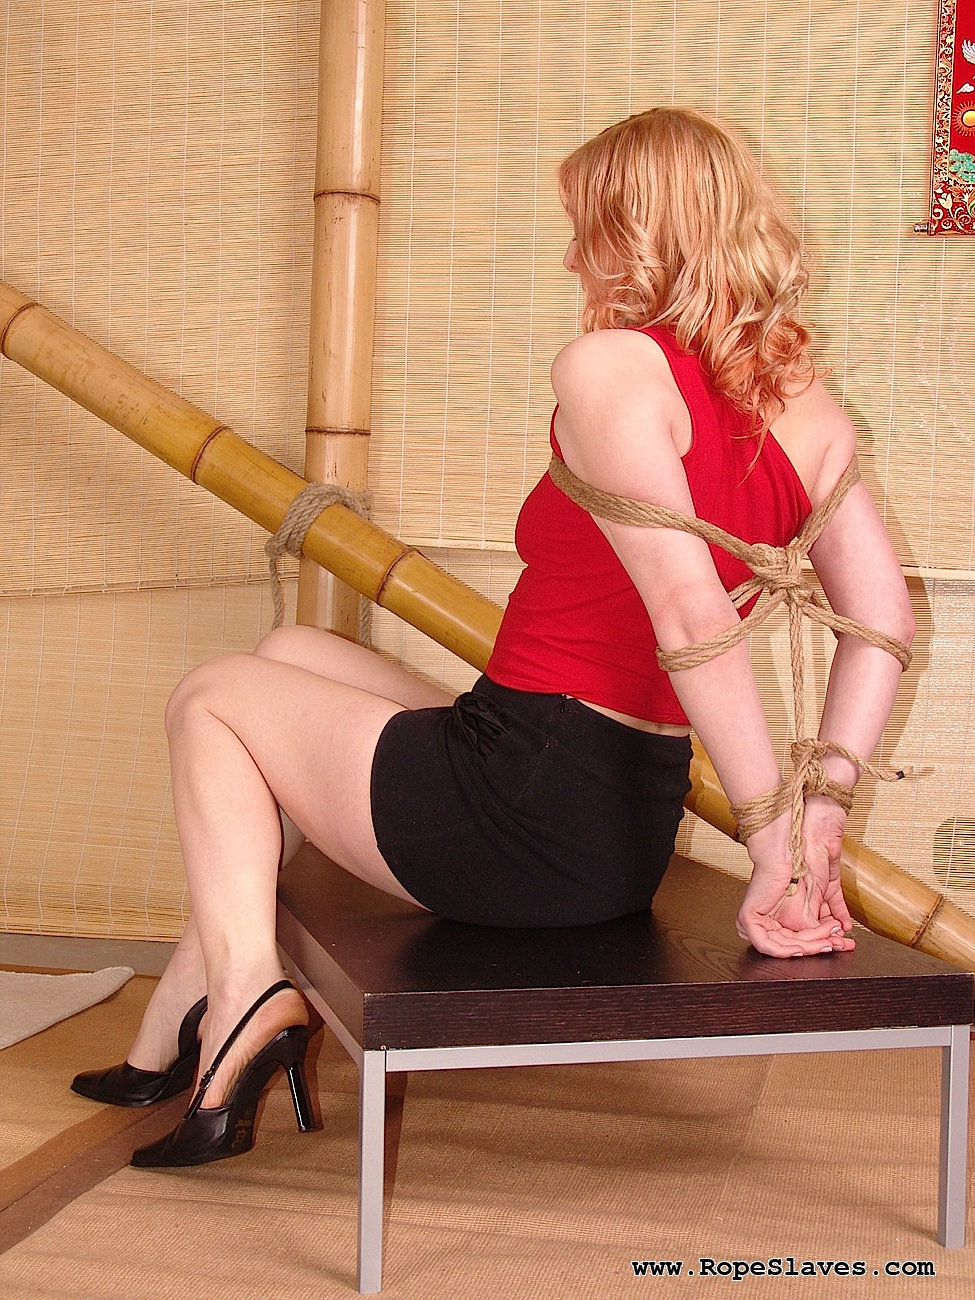 04 296.80 Dsm   Olga Bondage Rope Porn